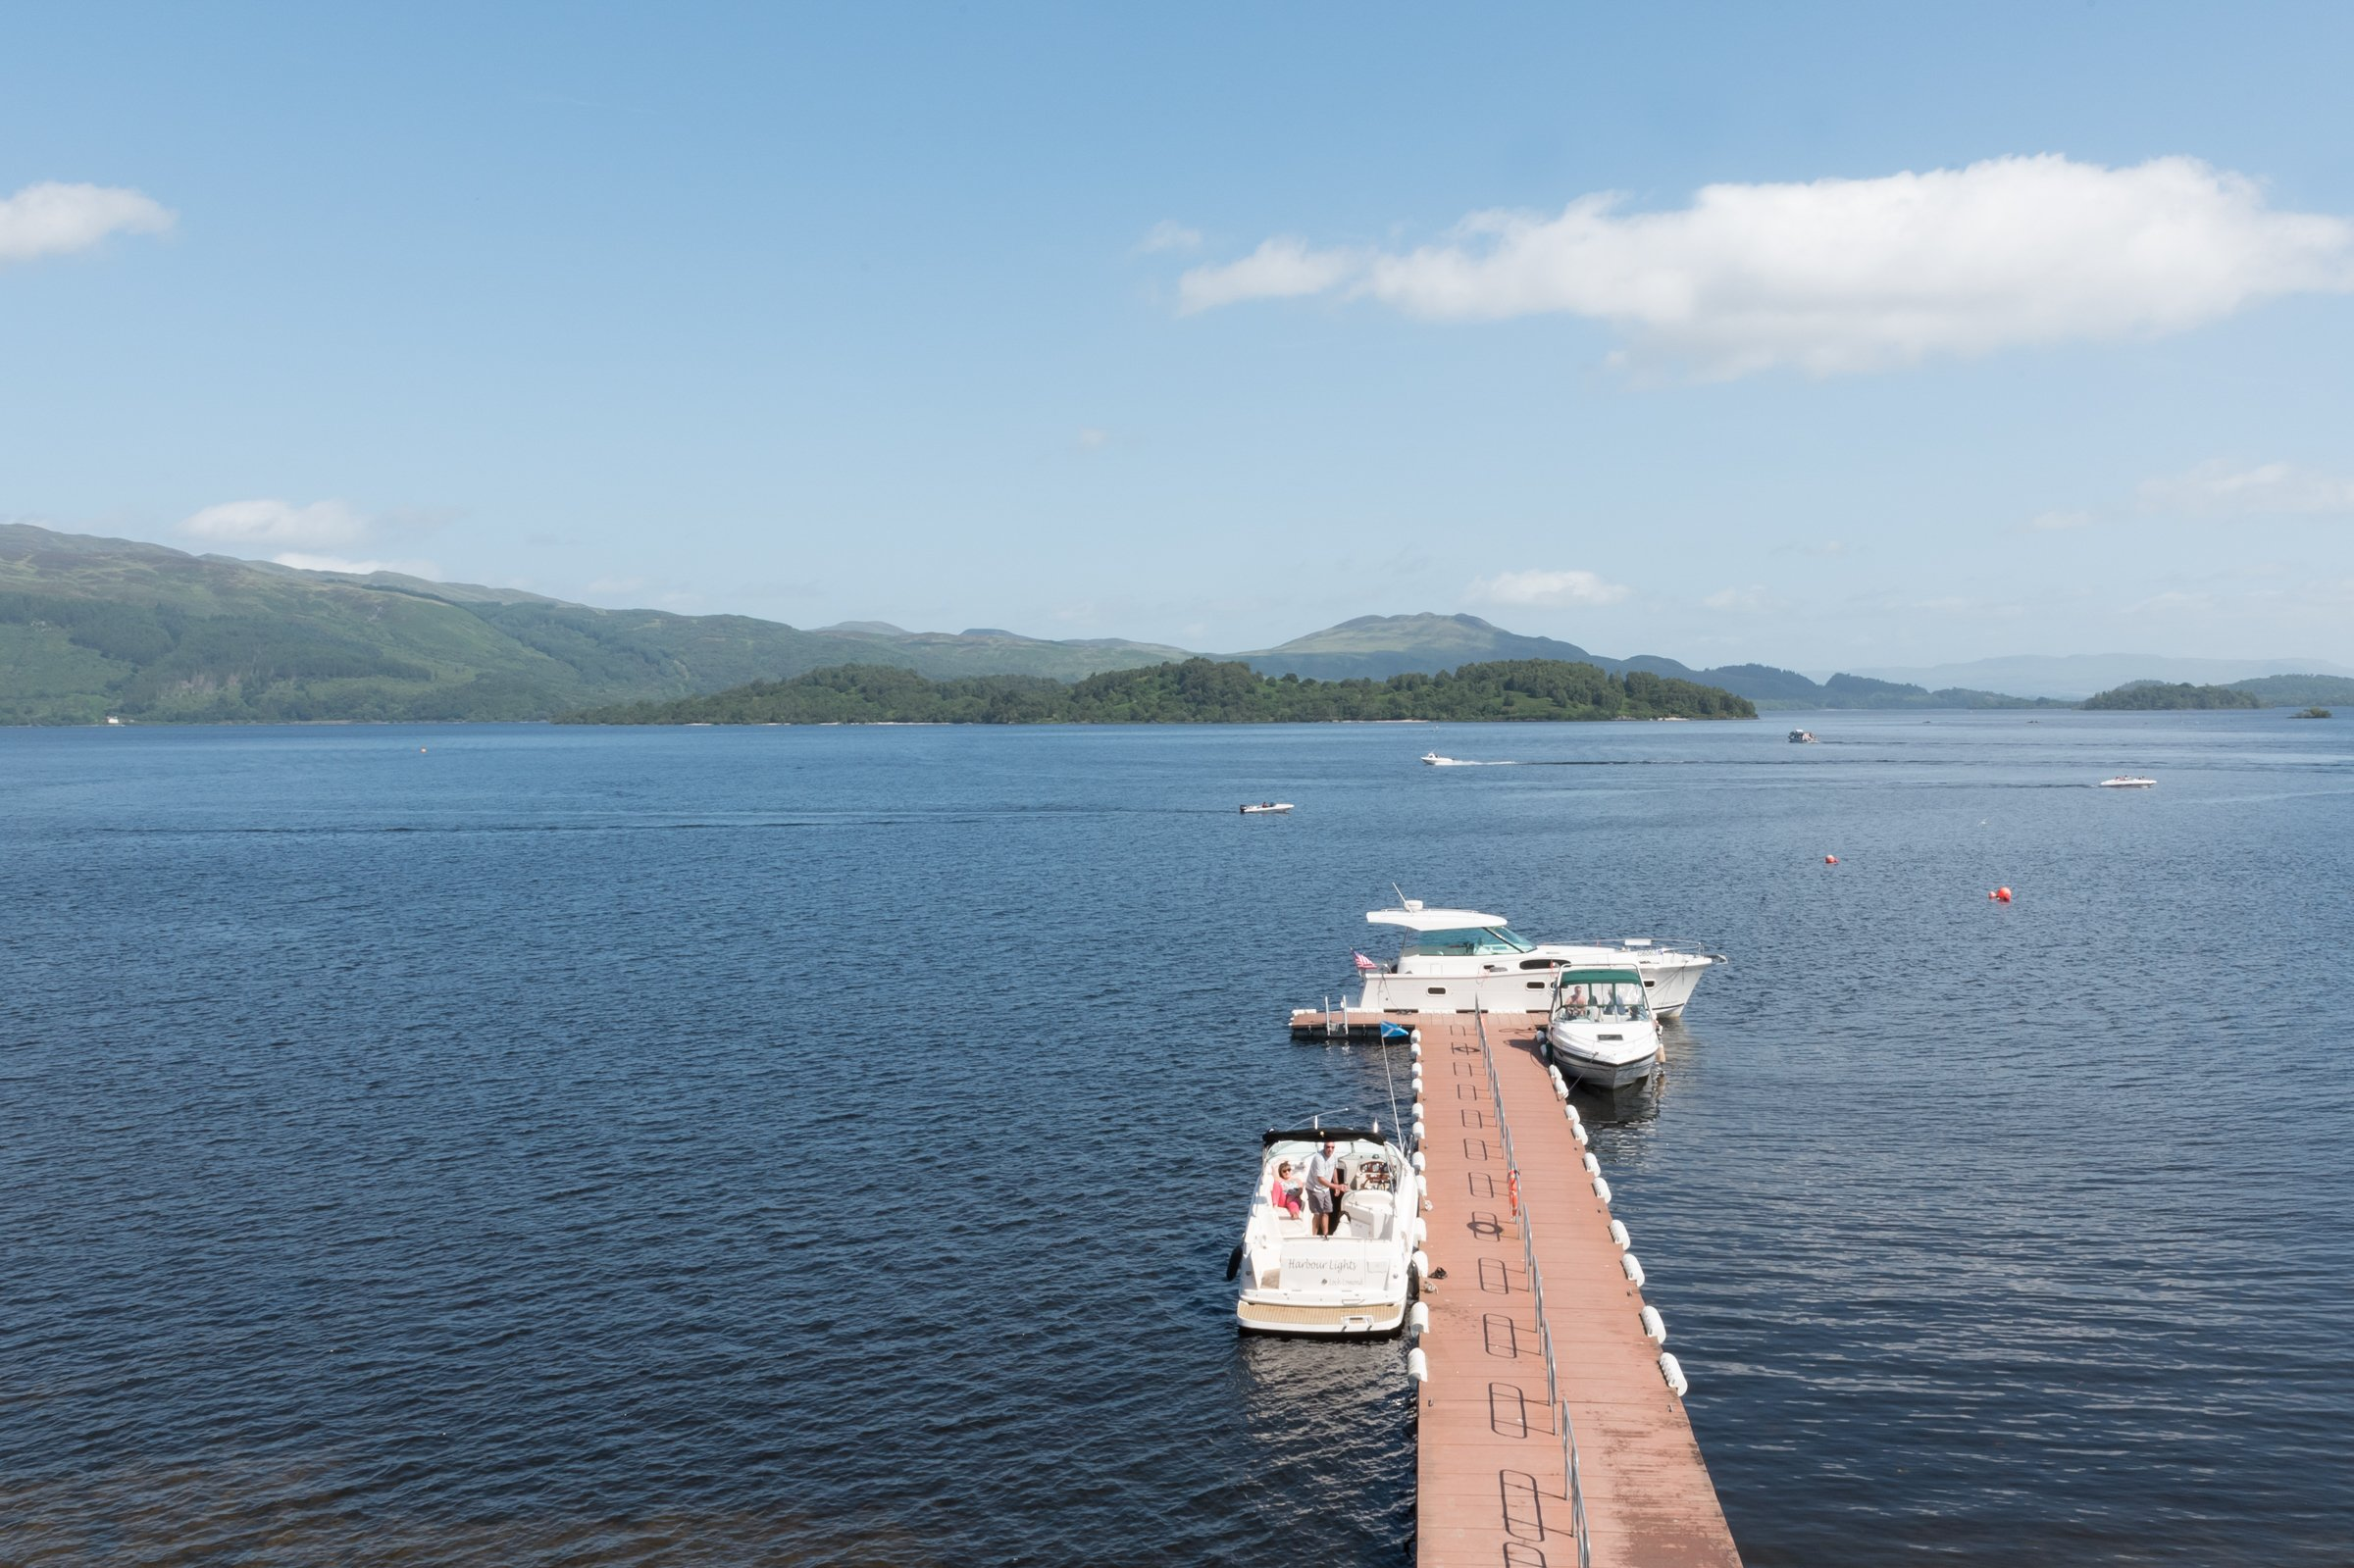 Child Friendly Travel on Loch Lomond, Scotland